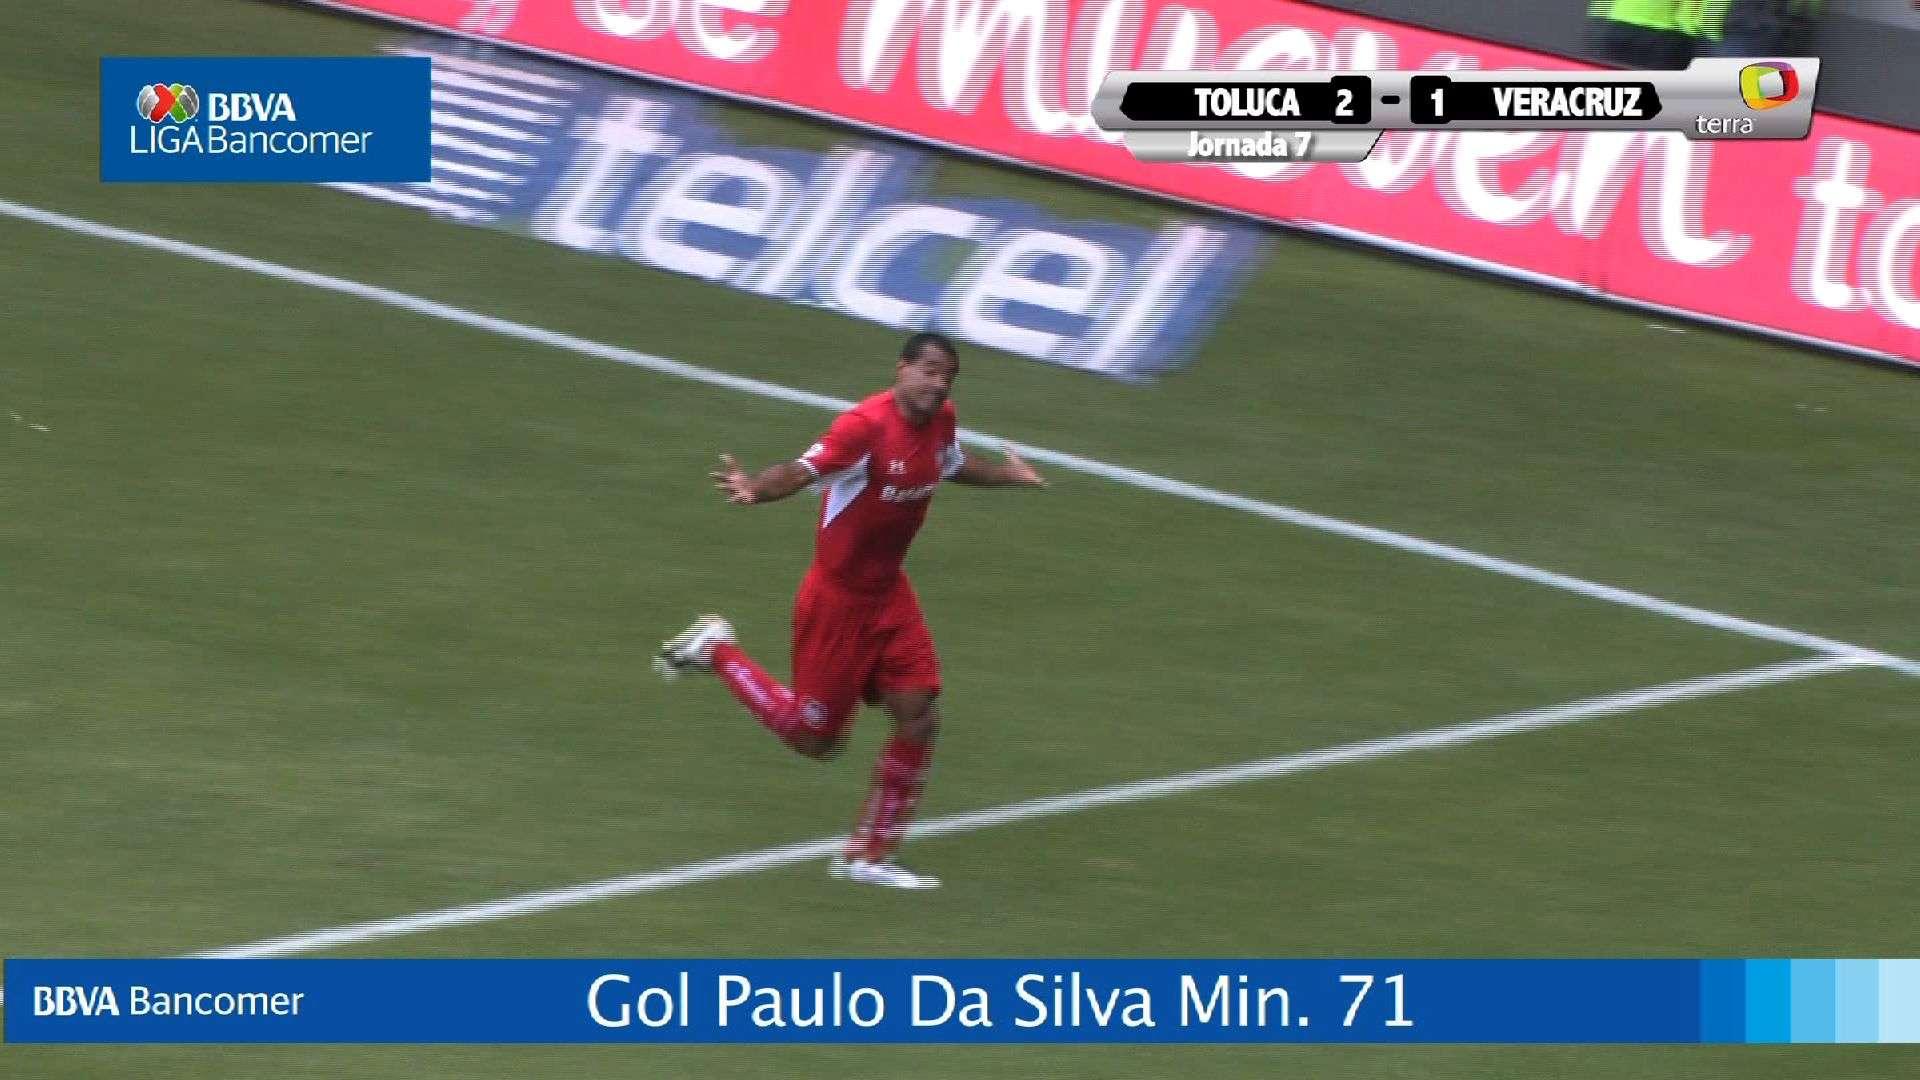 Jornada 7 Toluca 2 - 1 Veracruz